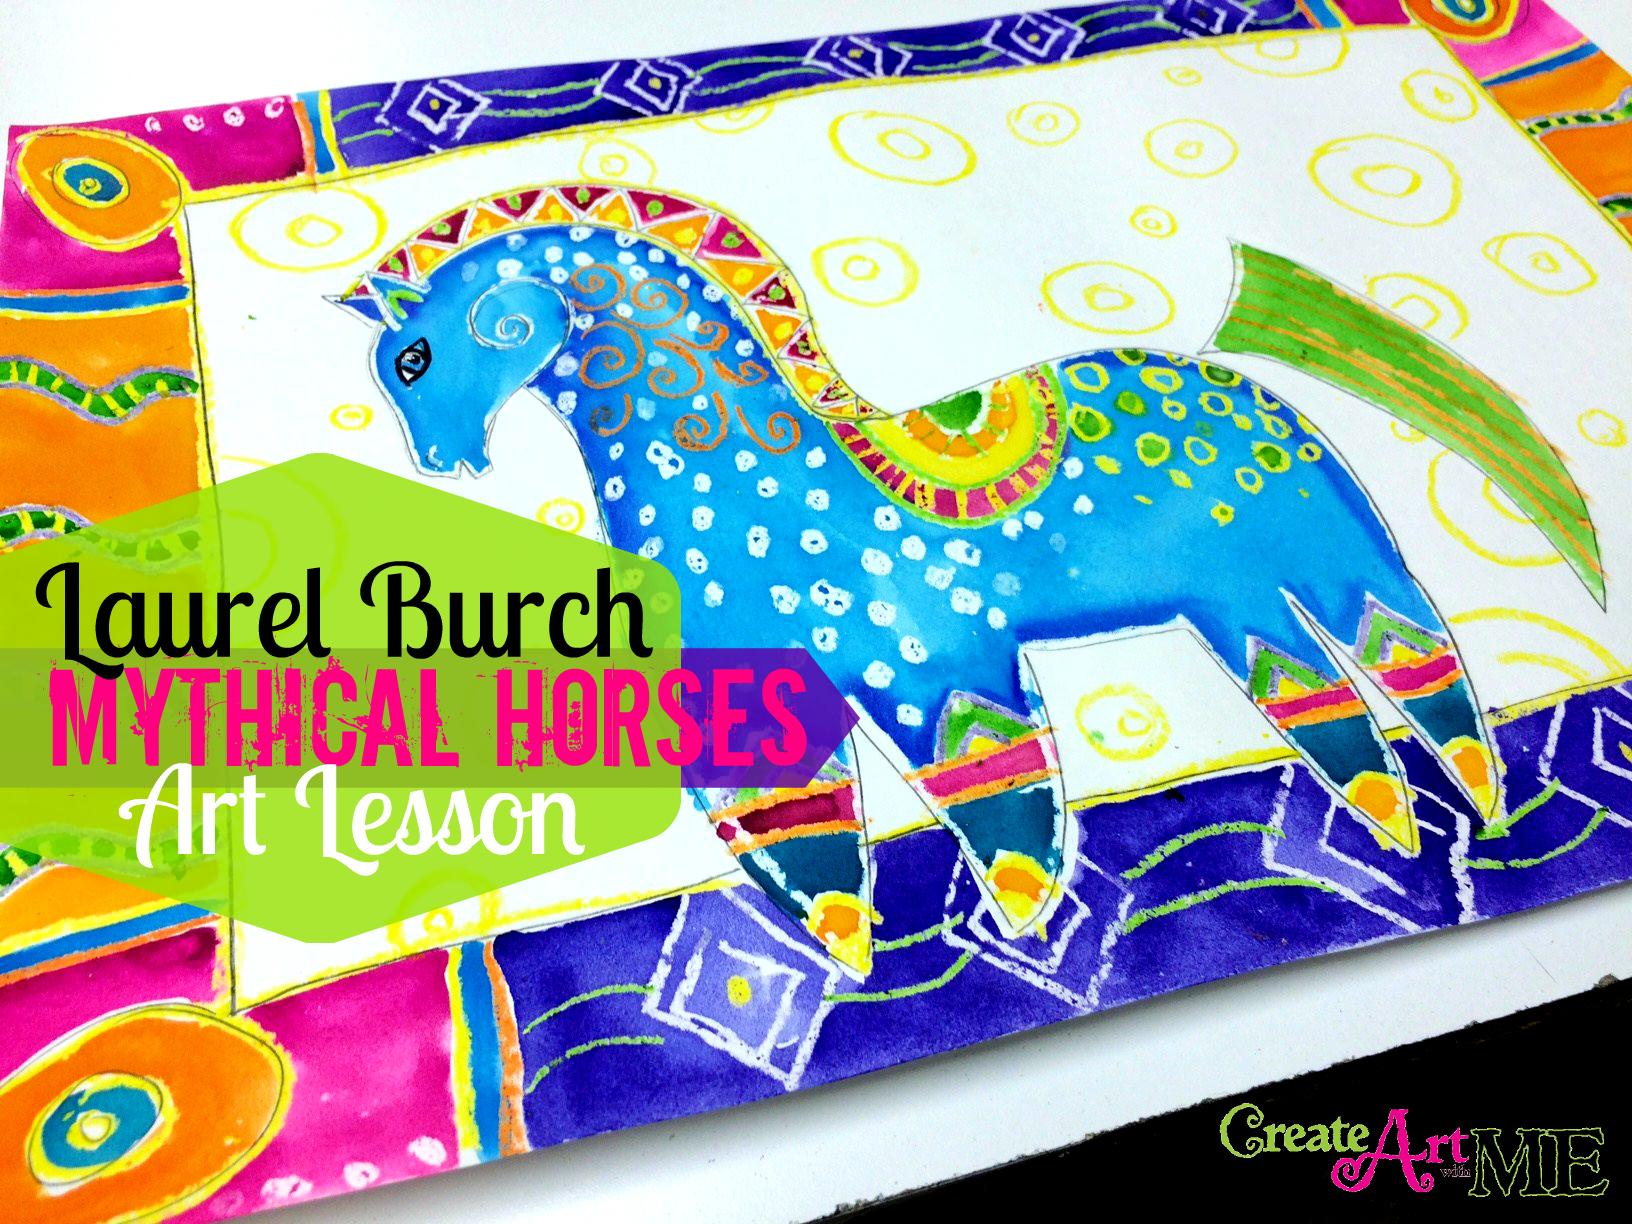 Laurel Burch Mythical Horses Inspired Art Lesson